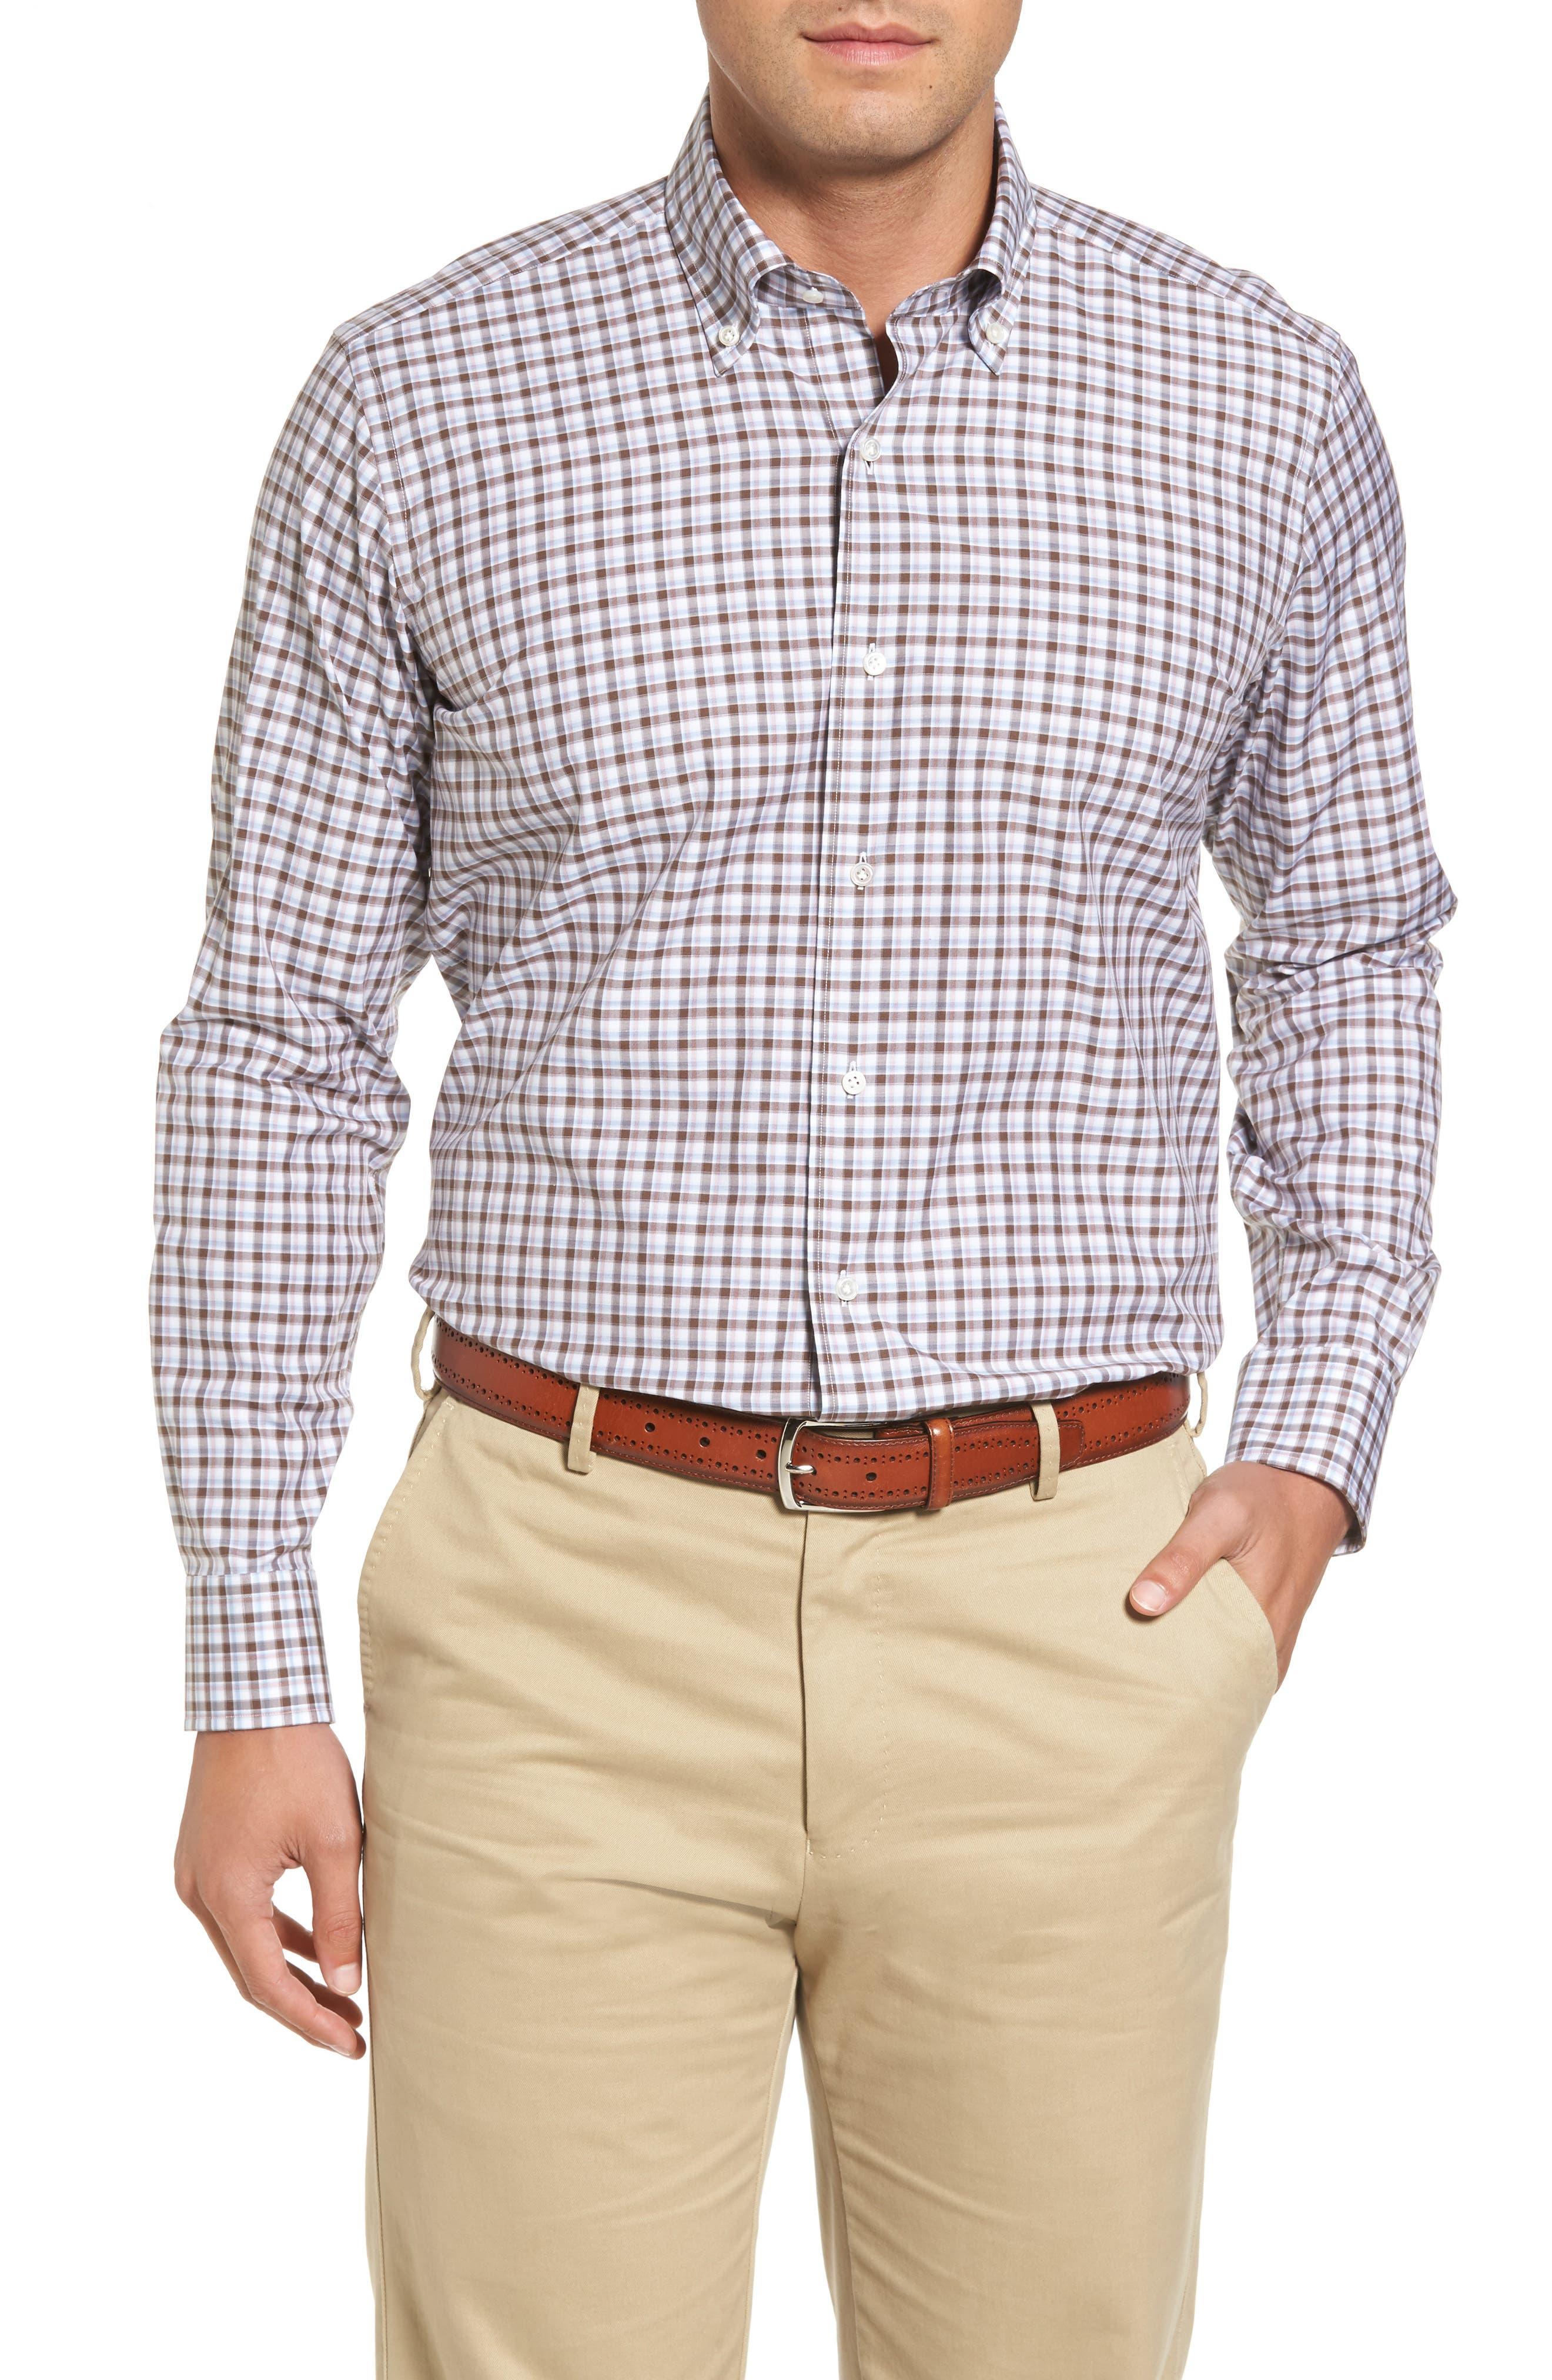 Peter Millar Northern Lights Regular Fit Check Sport Shirt,                             Main thumbnail 1, color,                             203